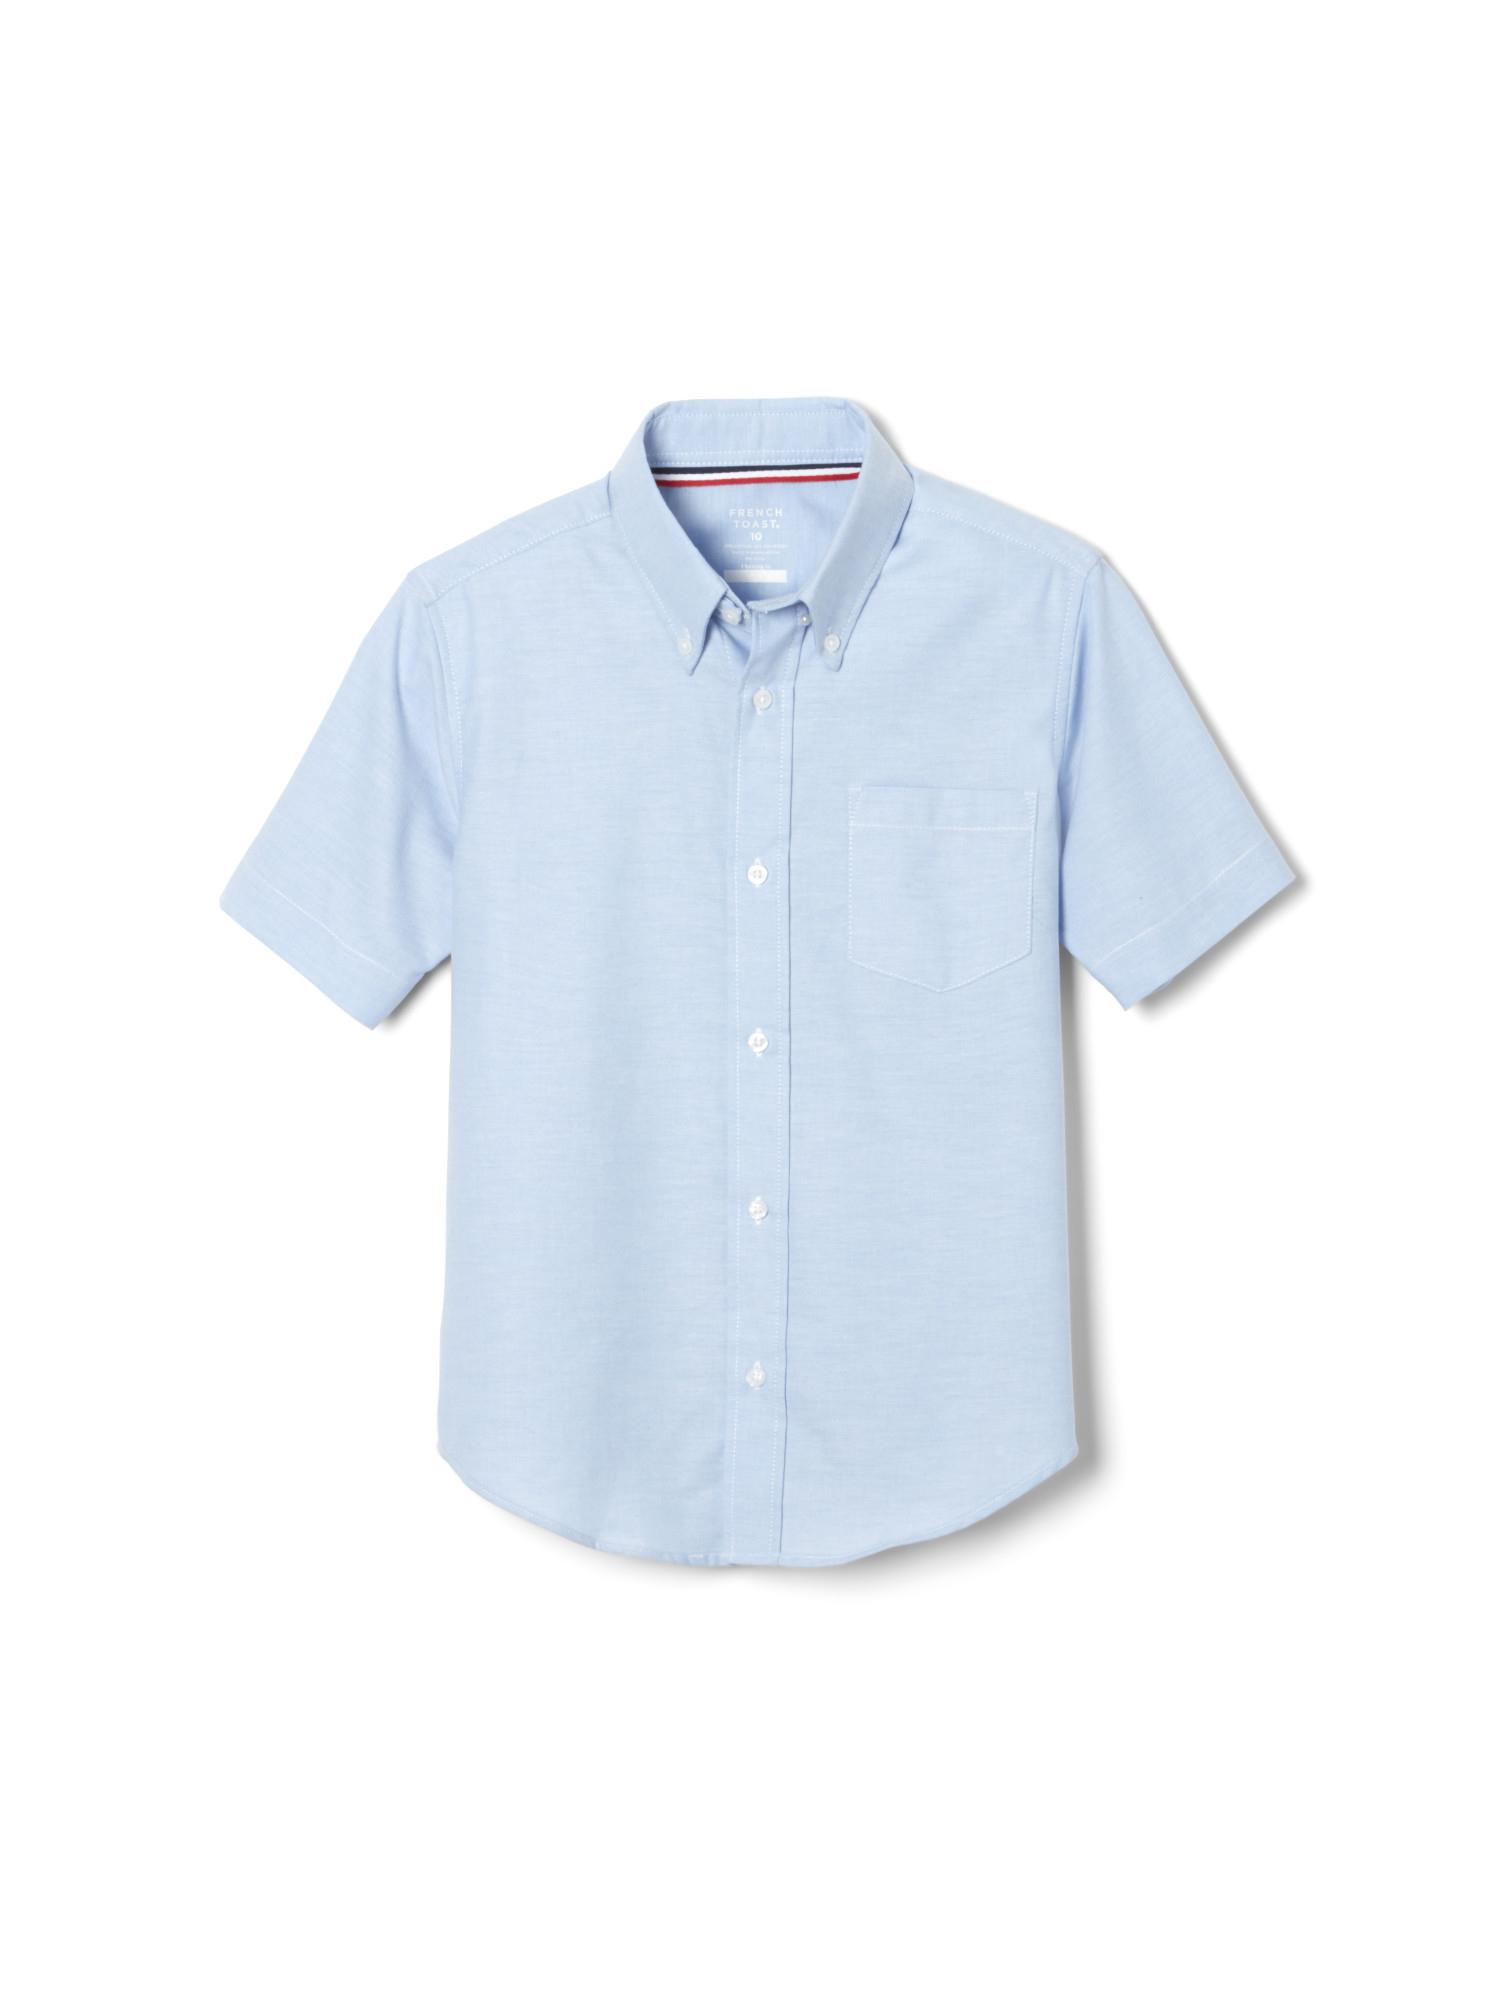 French Toast Boys Light Blue Short Sleeve Polo Shirt Lot Of 3 Size 14